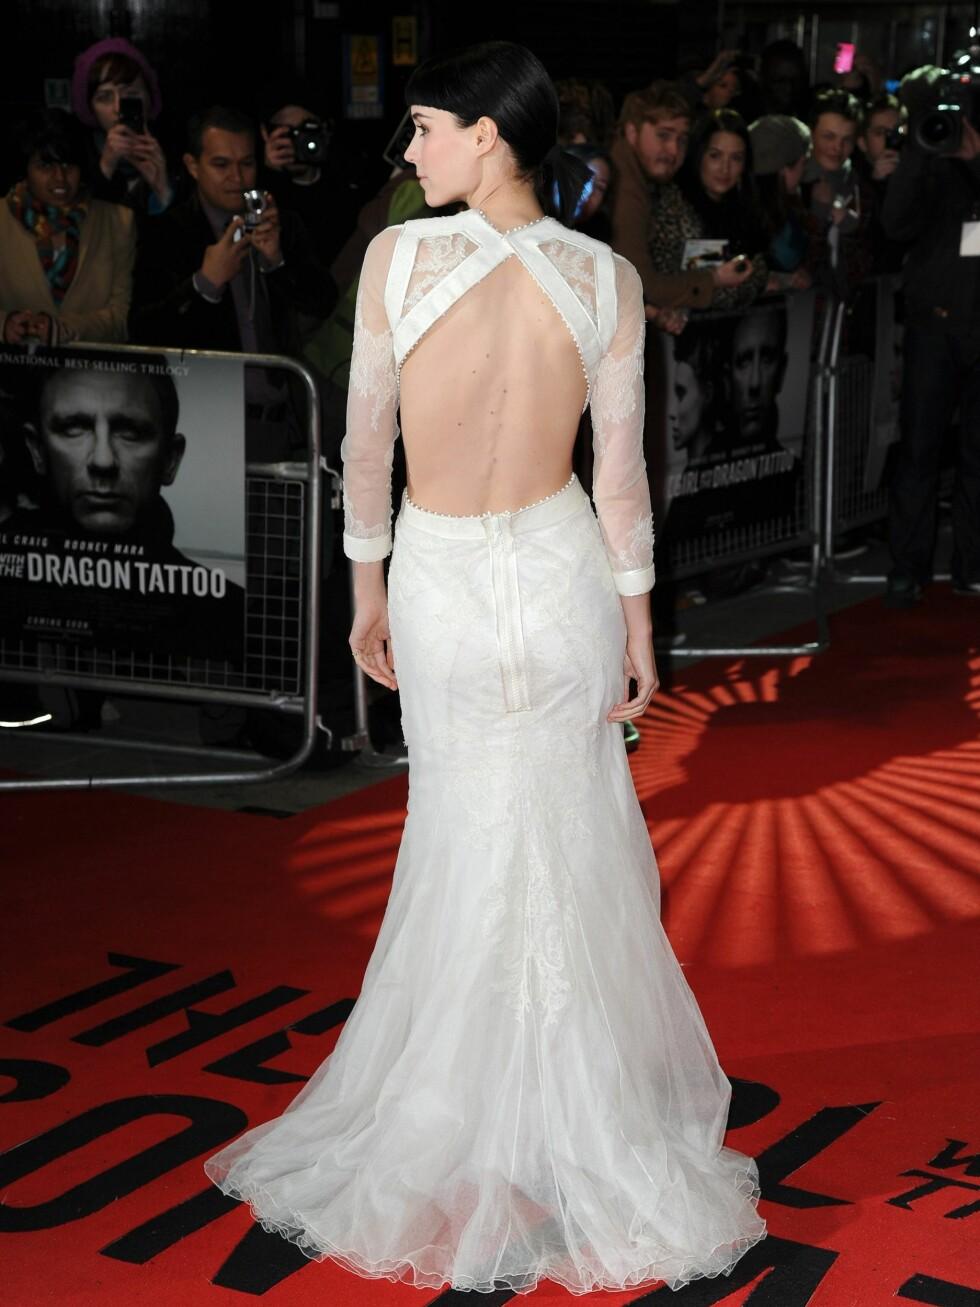 Den fotside kjolen har bar rygg slep i chiffon. Foto: All Over Press